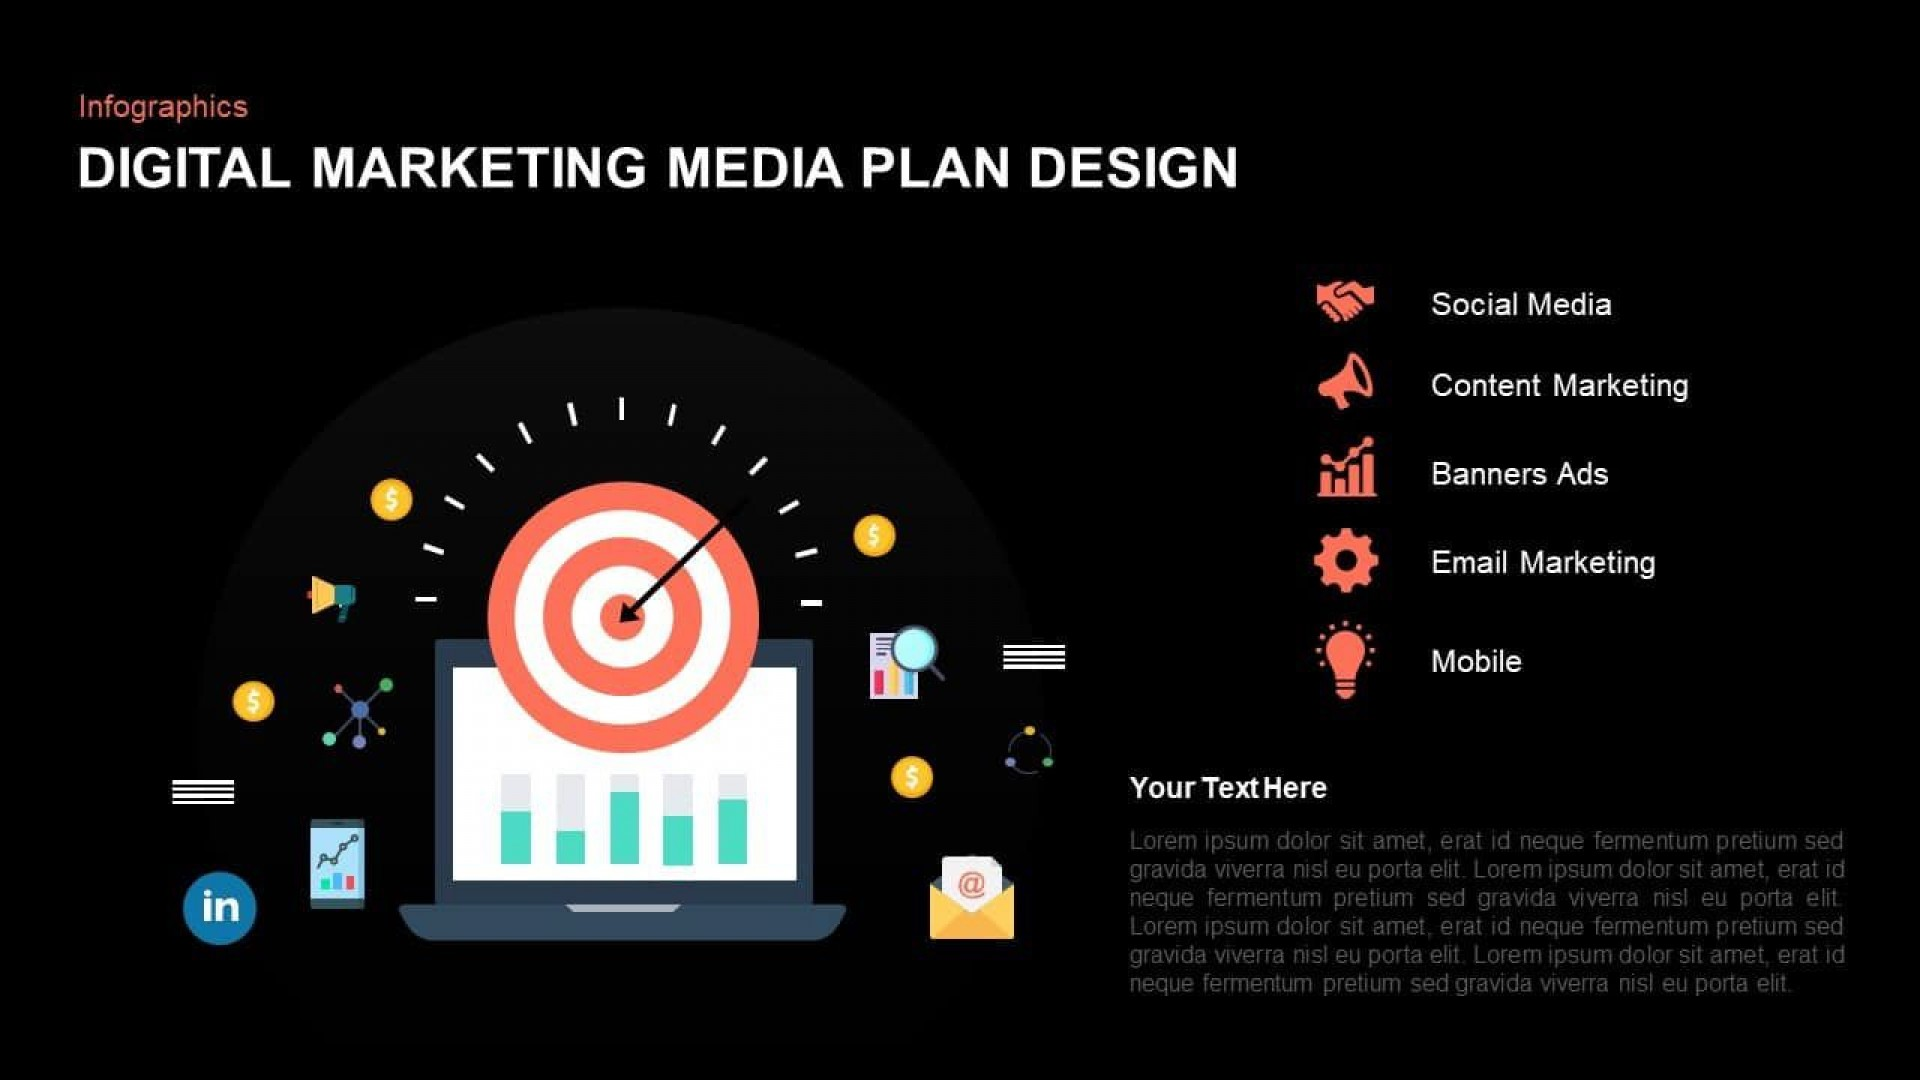 002 Frightening Digital Marketing Plan Template Ppt High Resolution  Presentation Free Slideshare1920